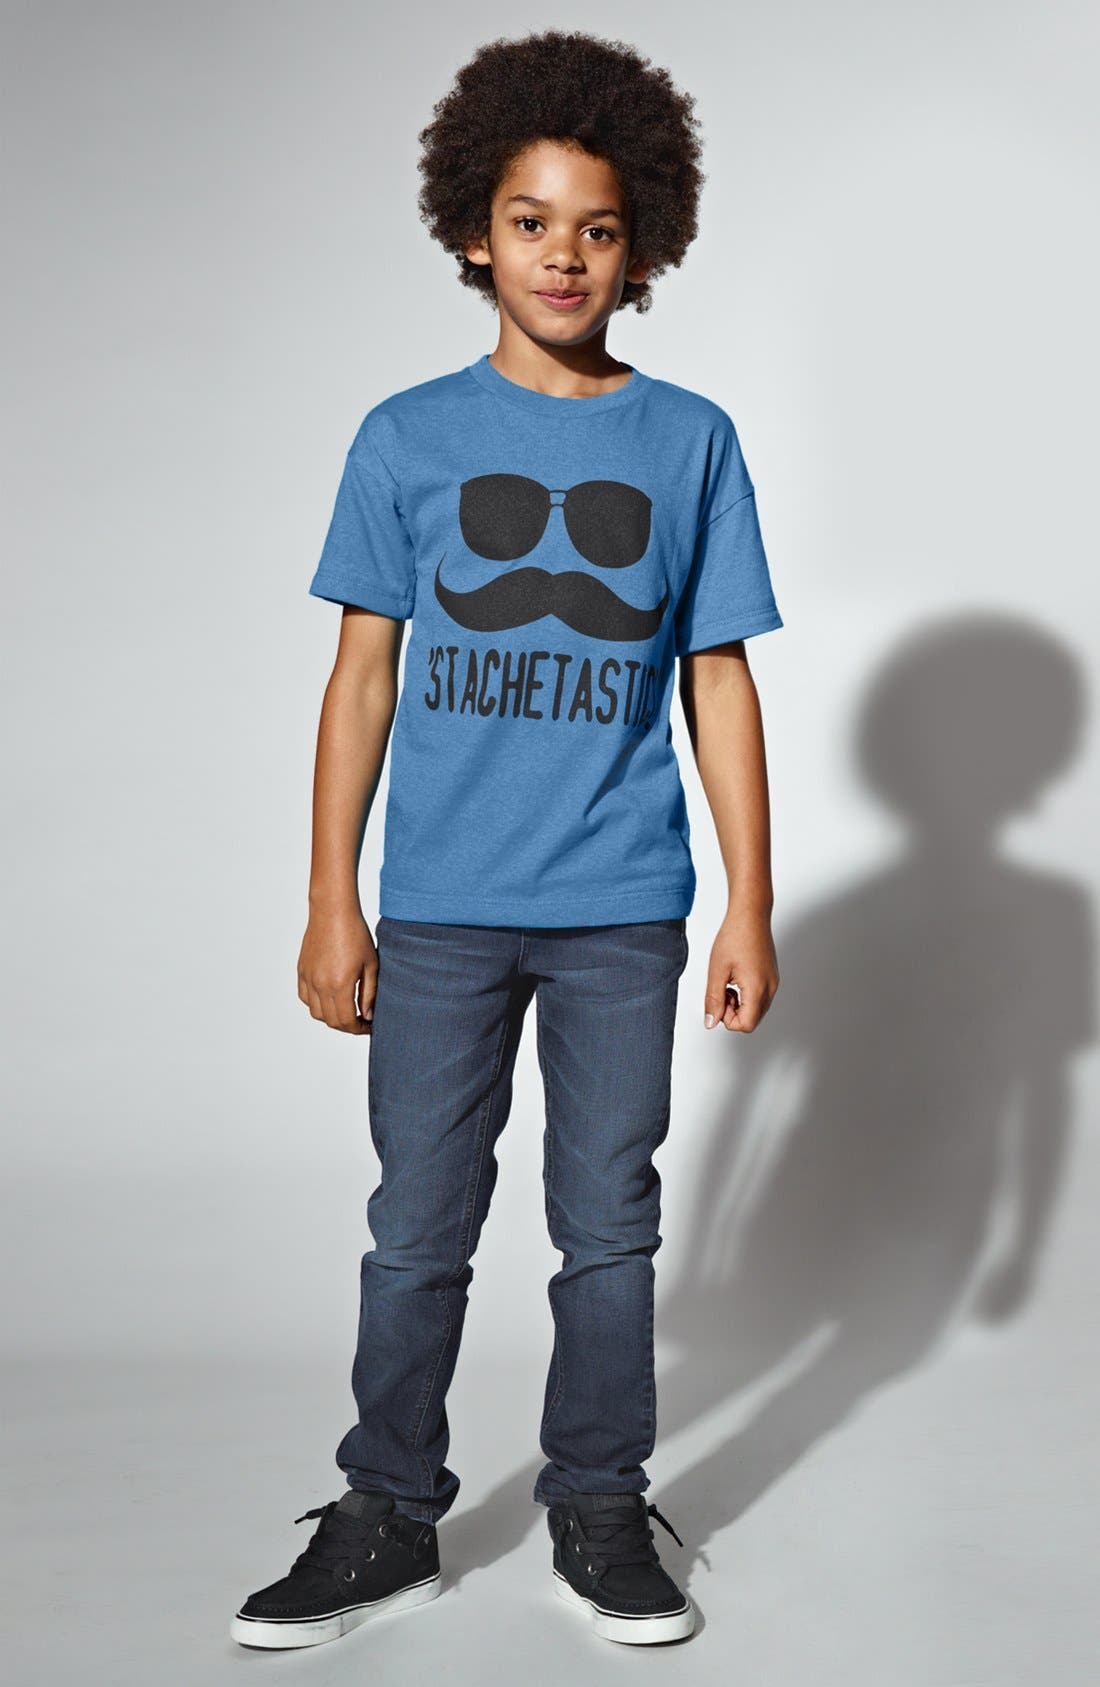 Alternate Image 2  - Jem 'Stachetastic' Screenprint T-Shirt (Big Boys)